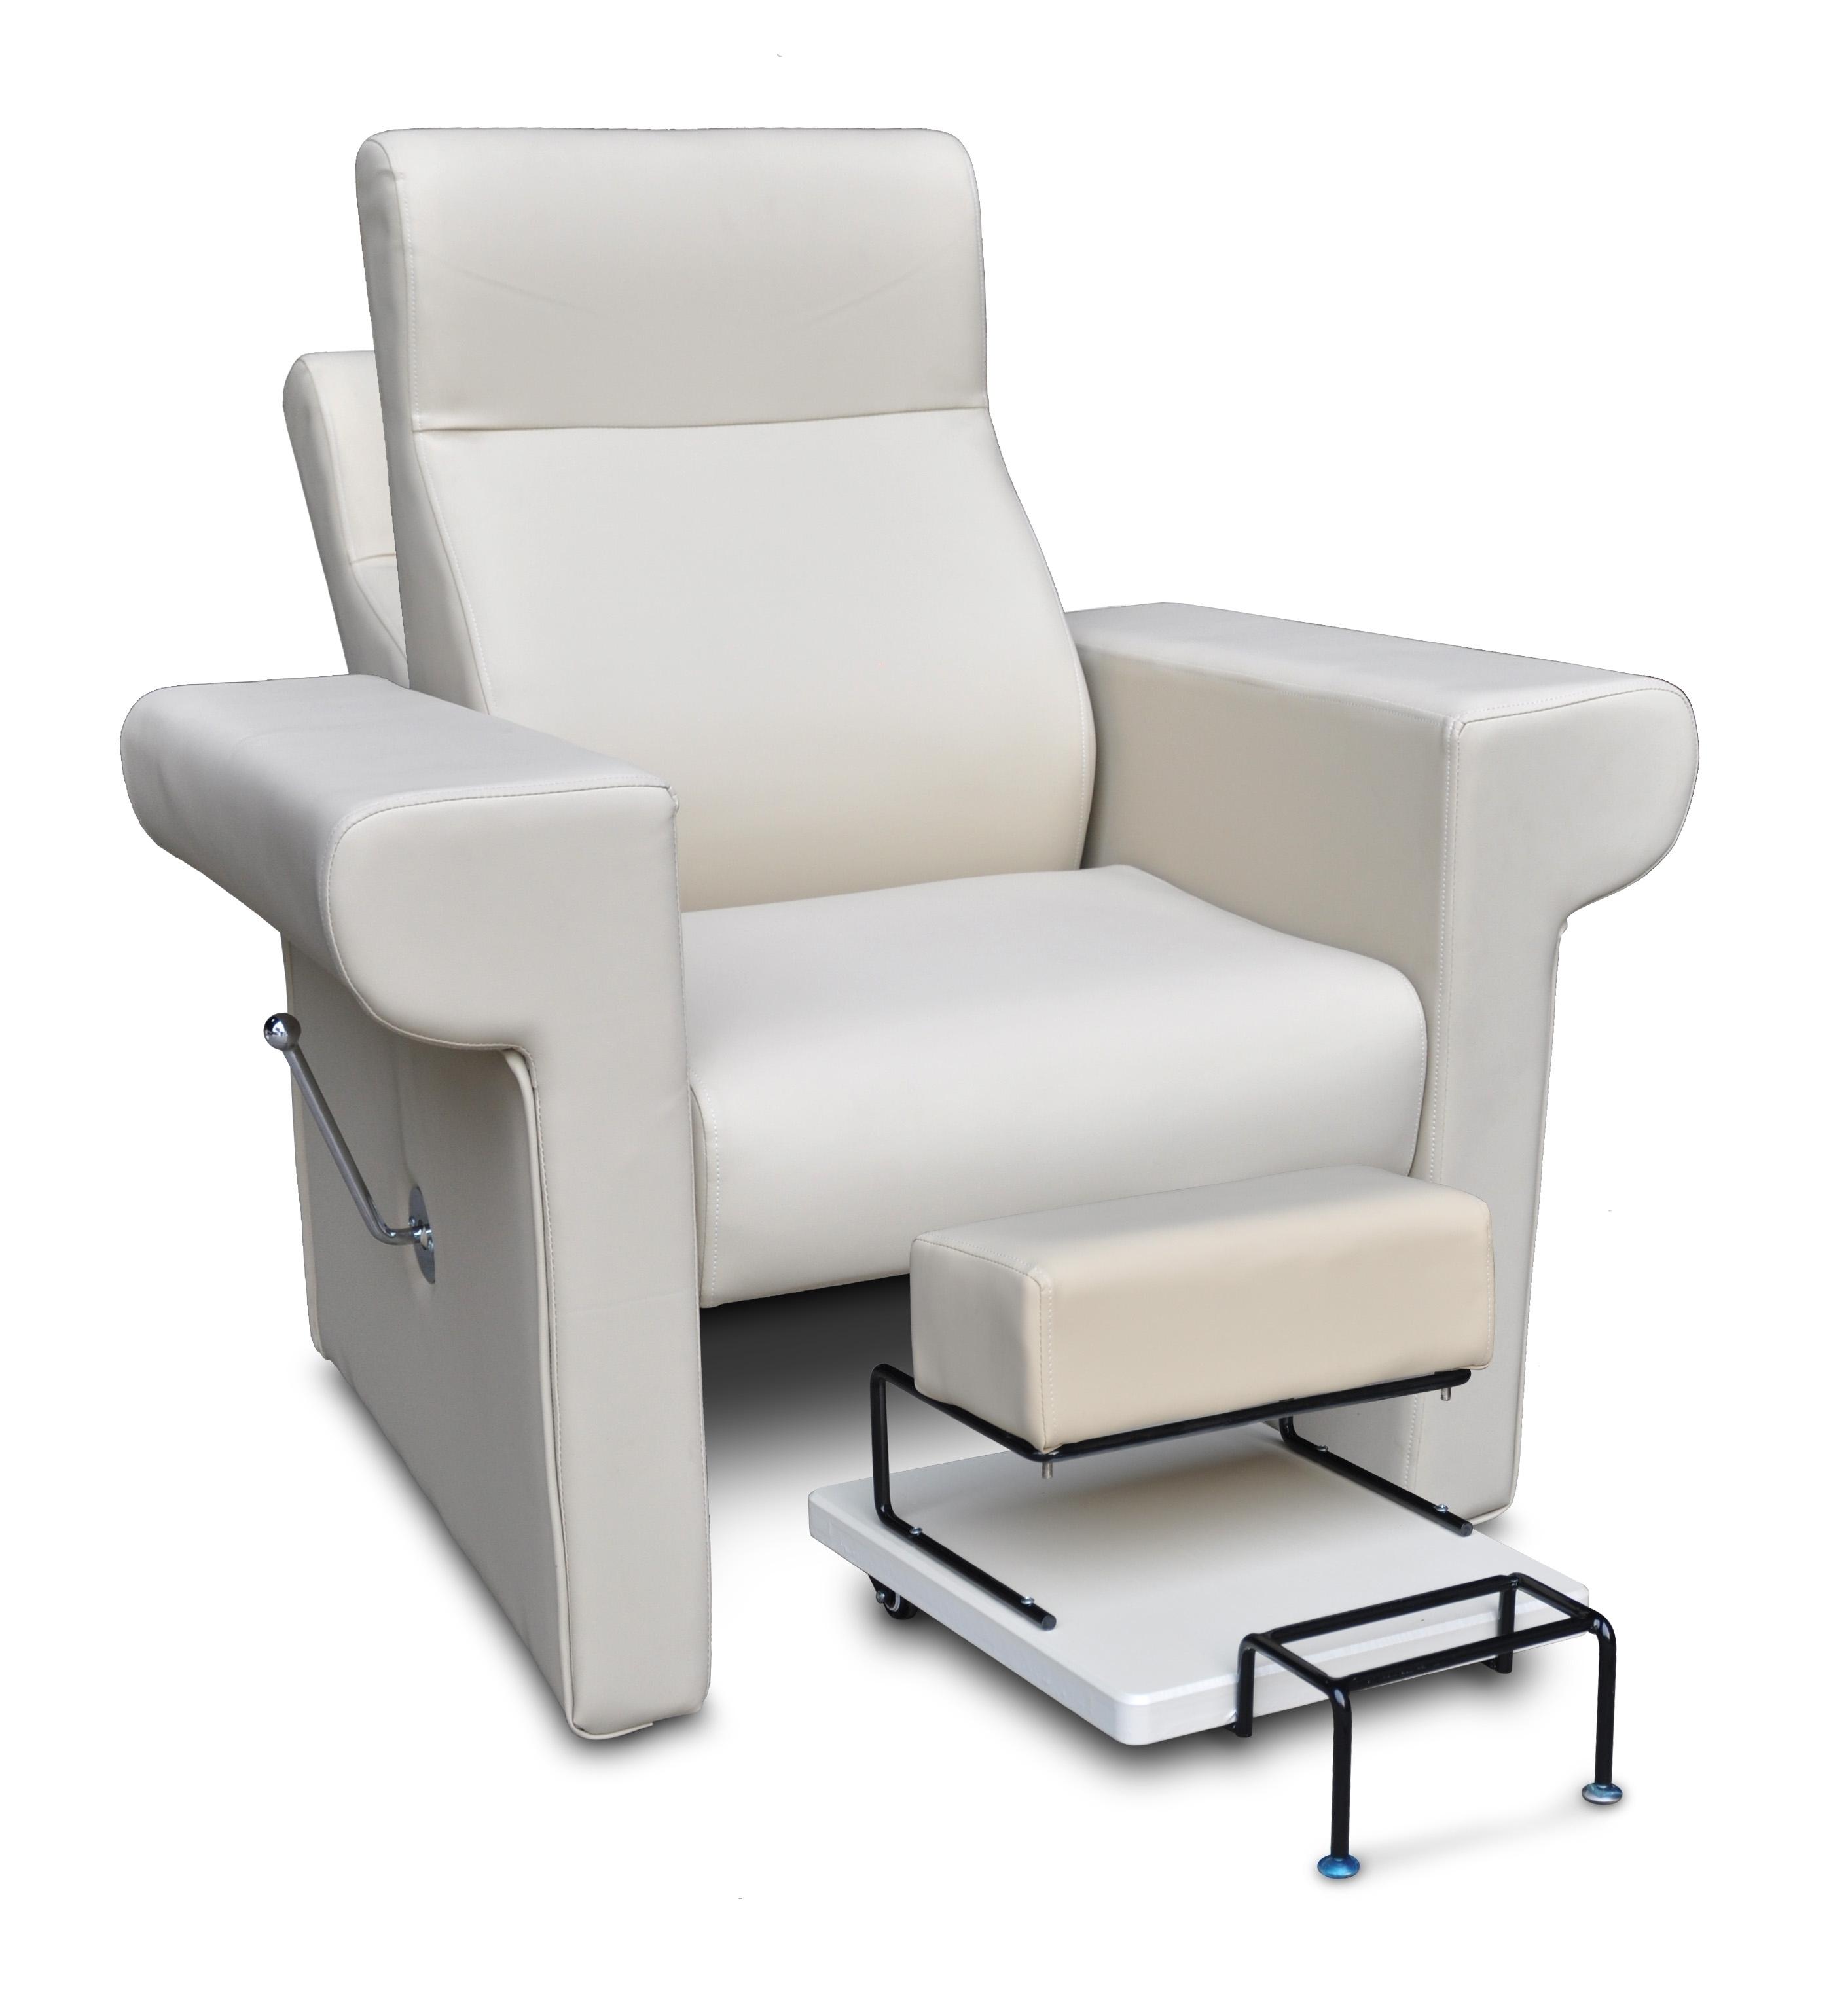 Foot Massage Sofa 82 With Foot Massage Sofa | Jinanhongyu Regarding Foot Massage Sofas (View 9 of 10)